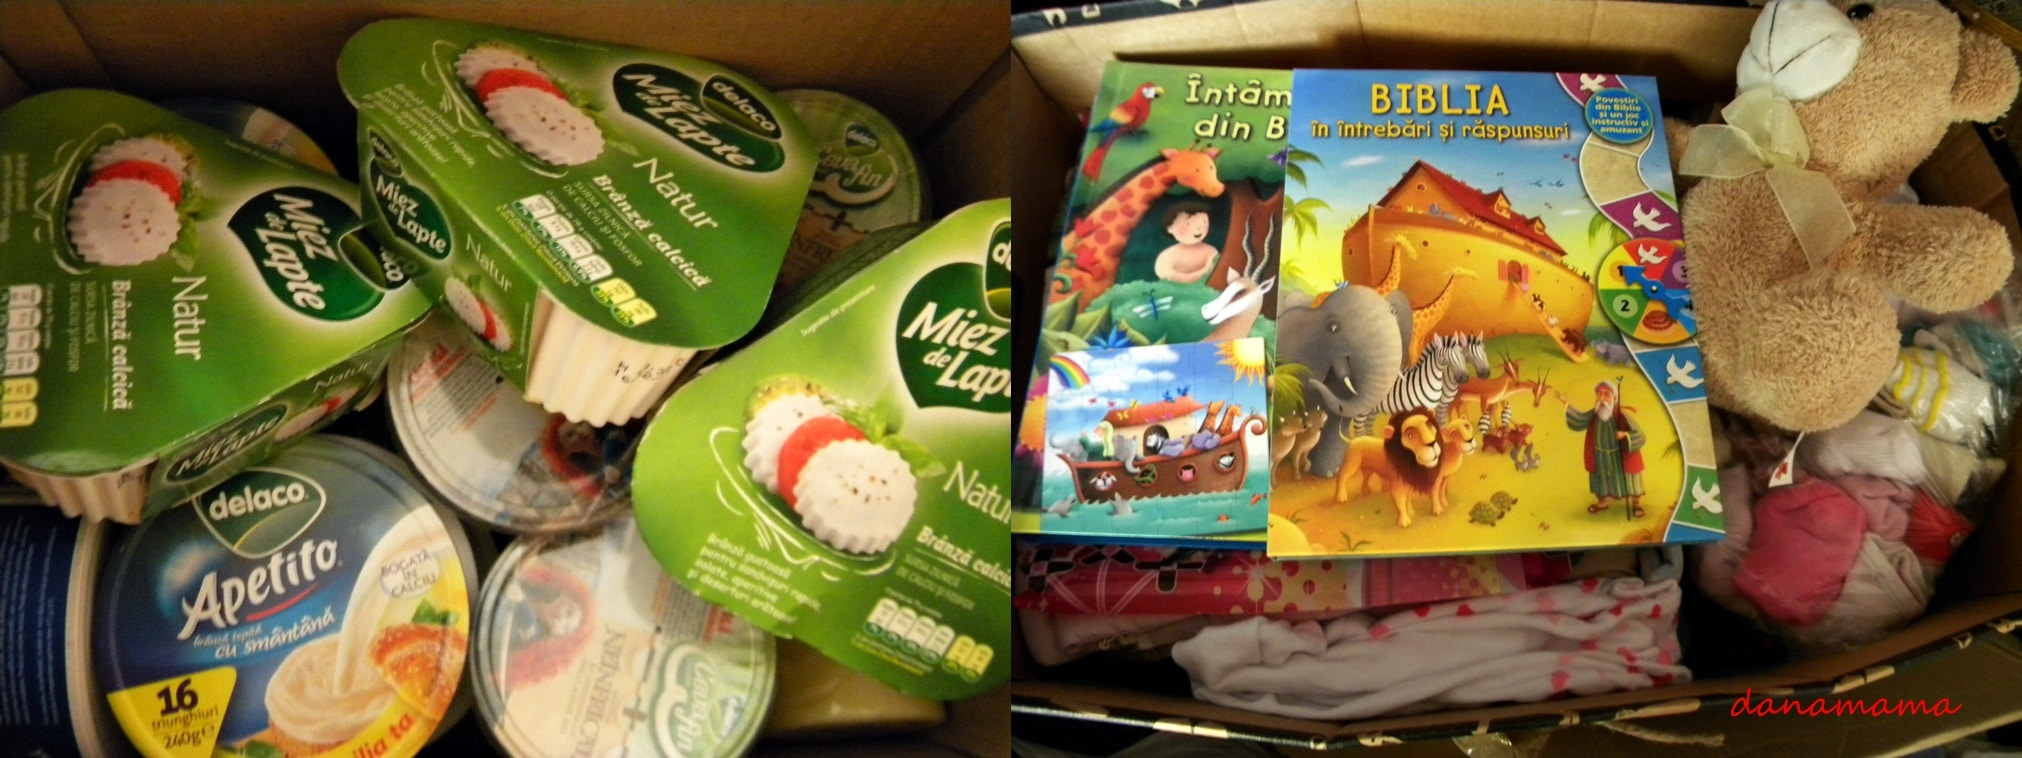 cadouri pt. copiii din Boreni.2jpg